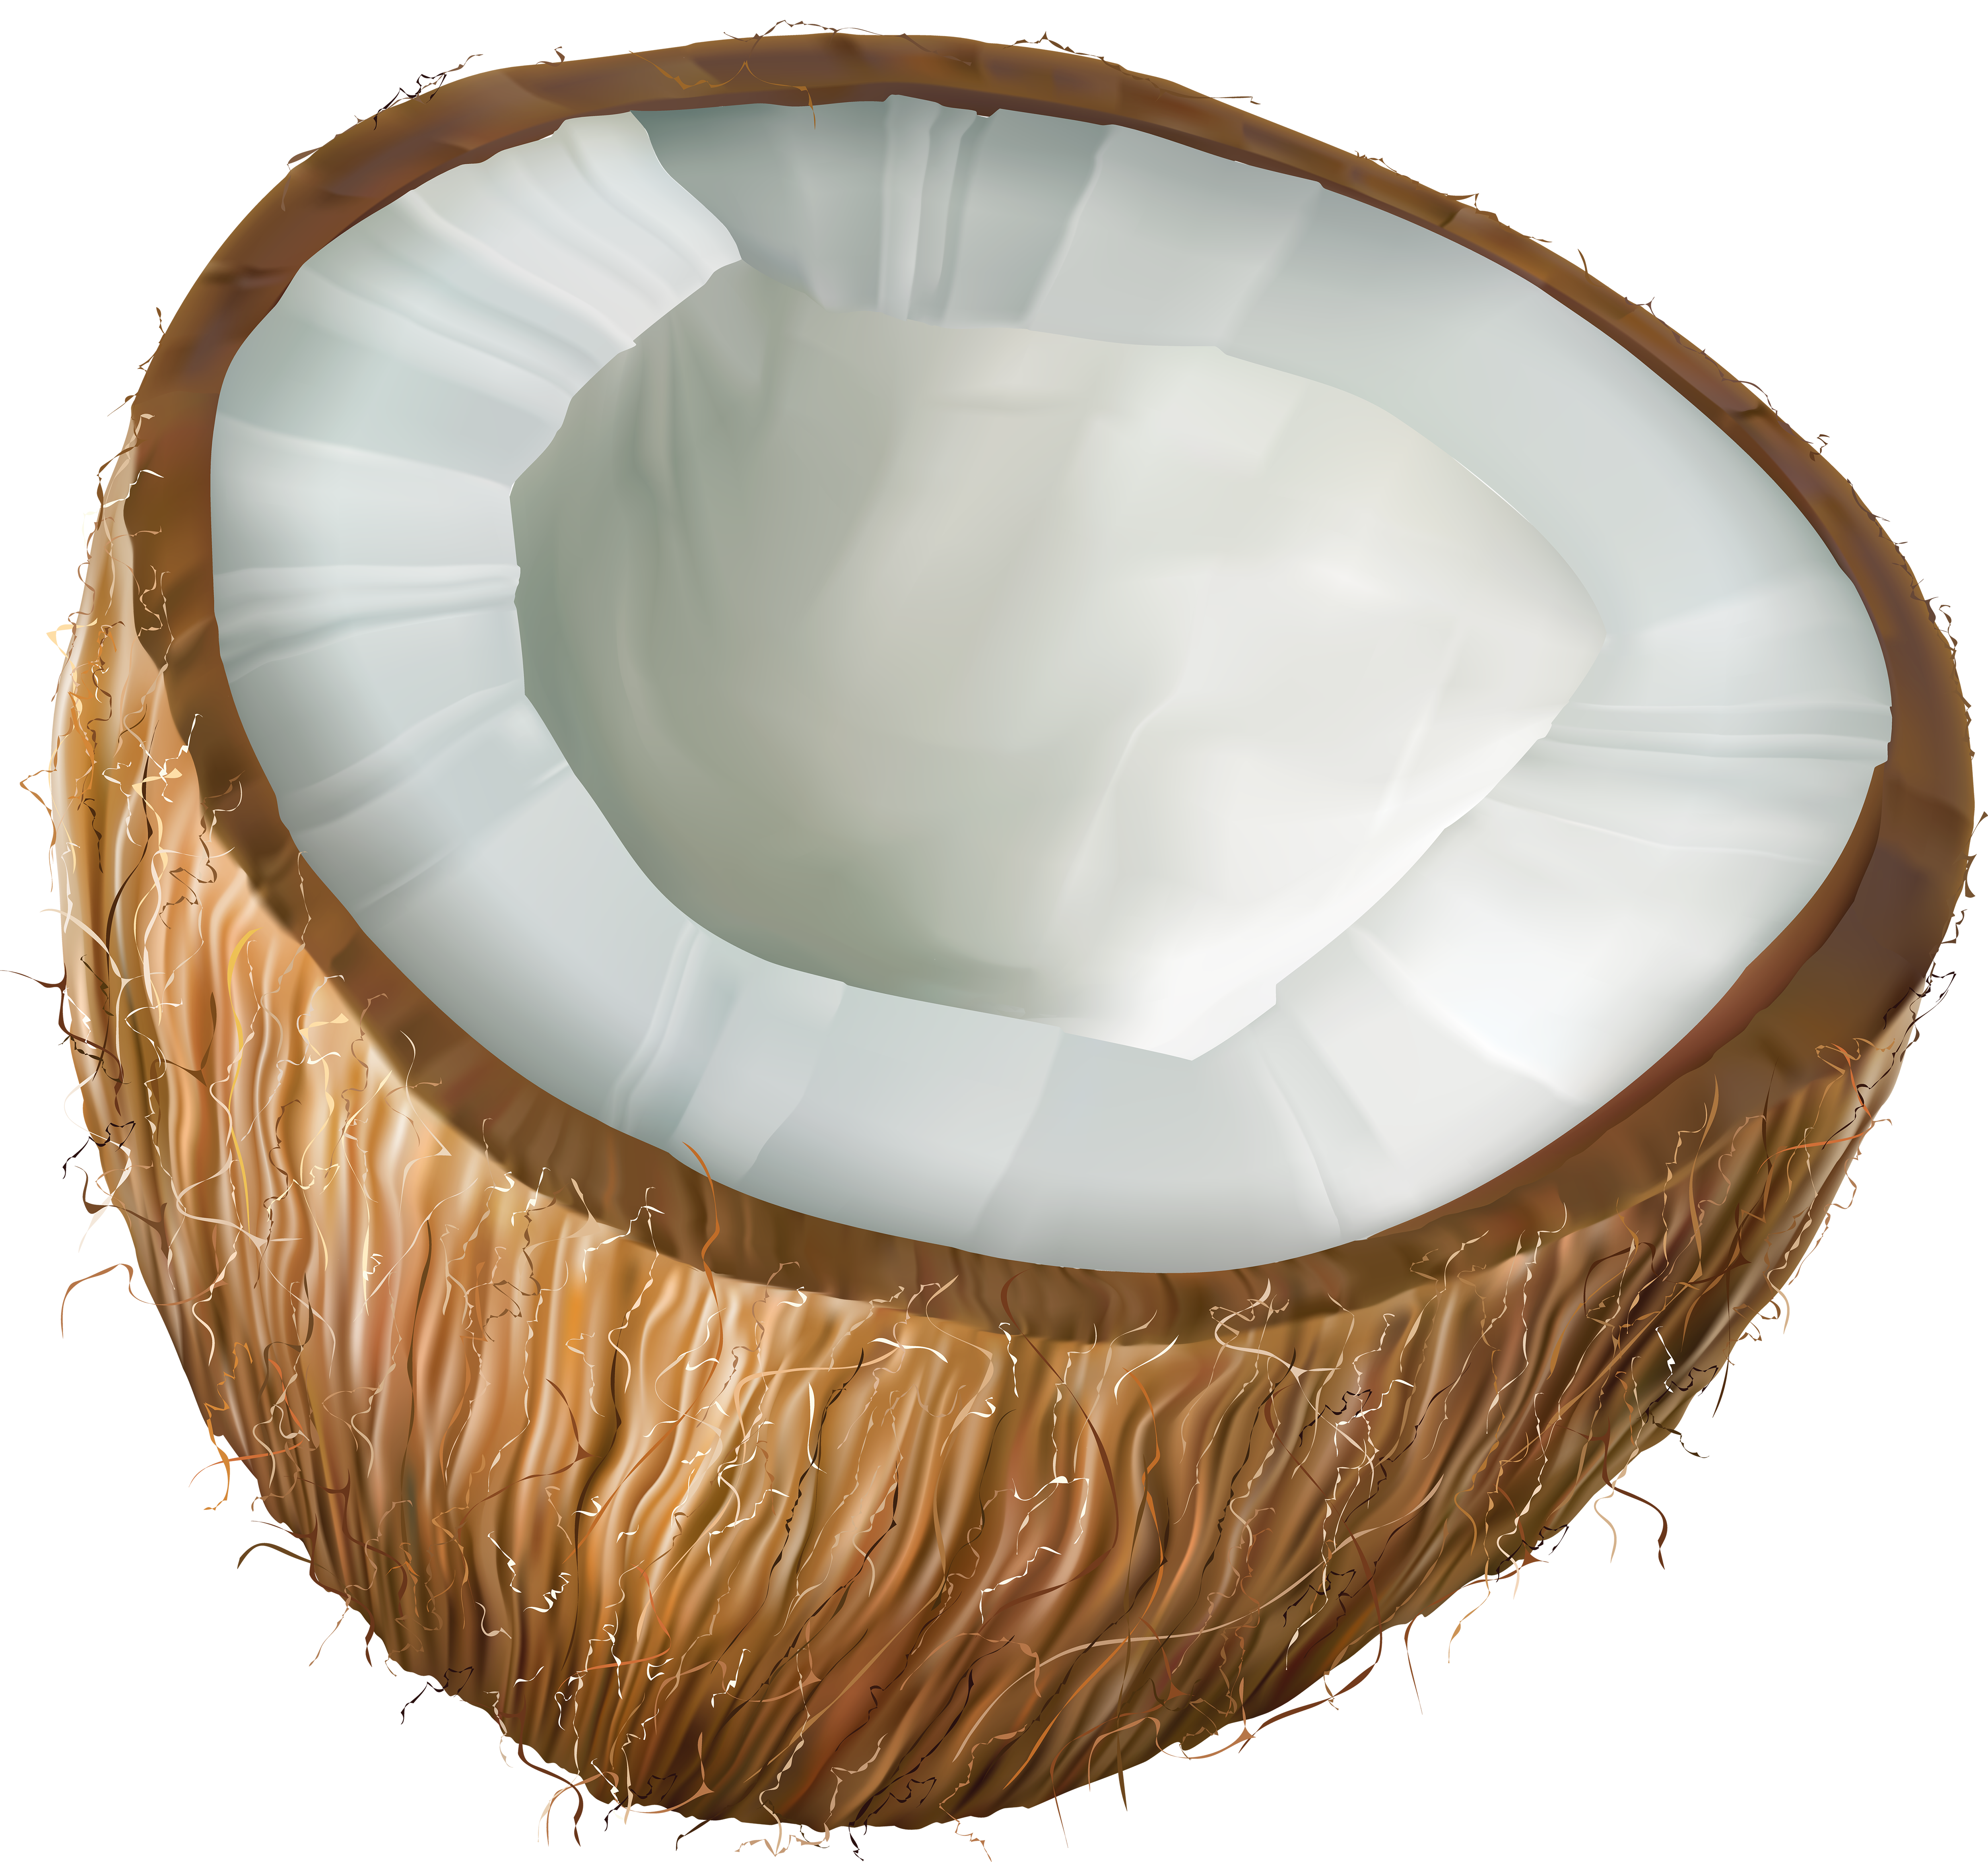 Coconut clipart. Transparent png clip art